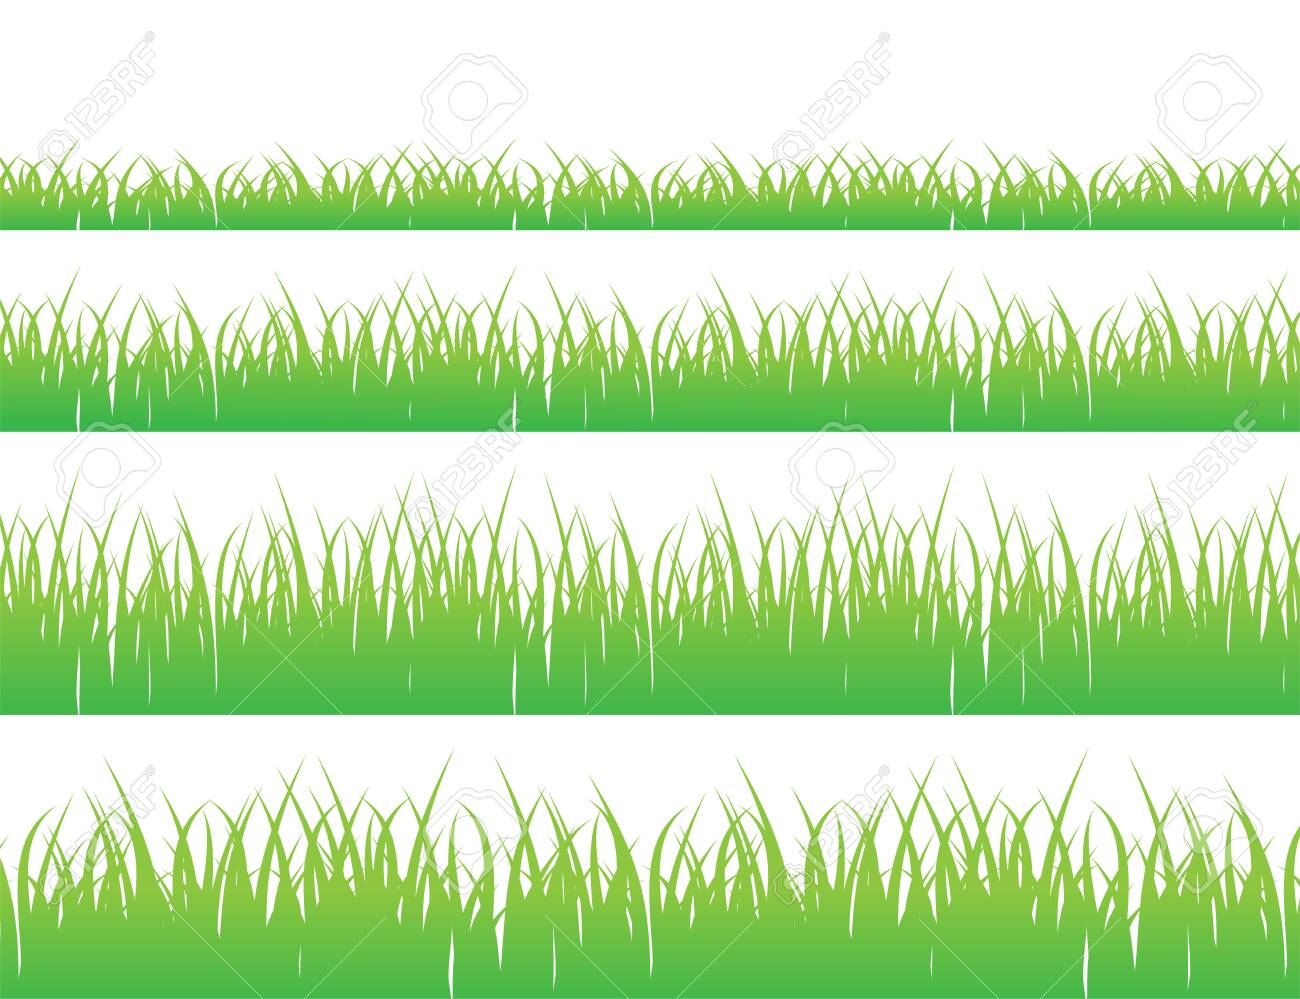 Green grass meadow border vector pattern. Grass background Vector Illustration. - 151473829